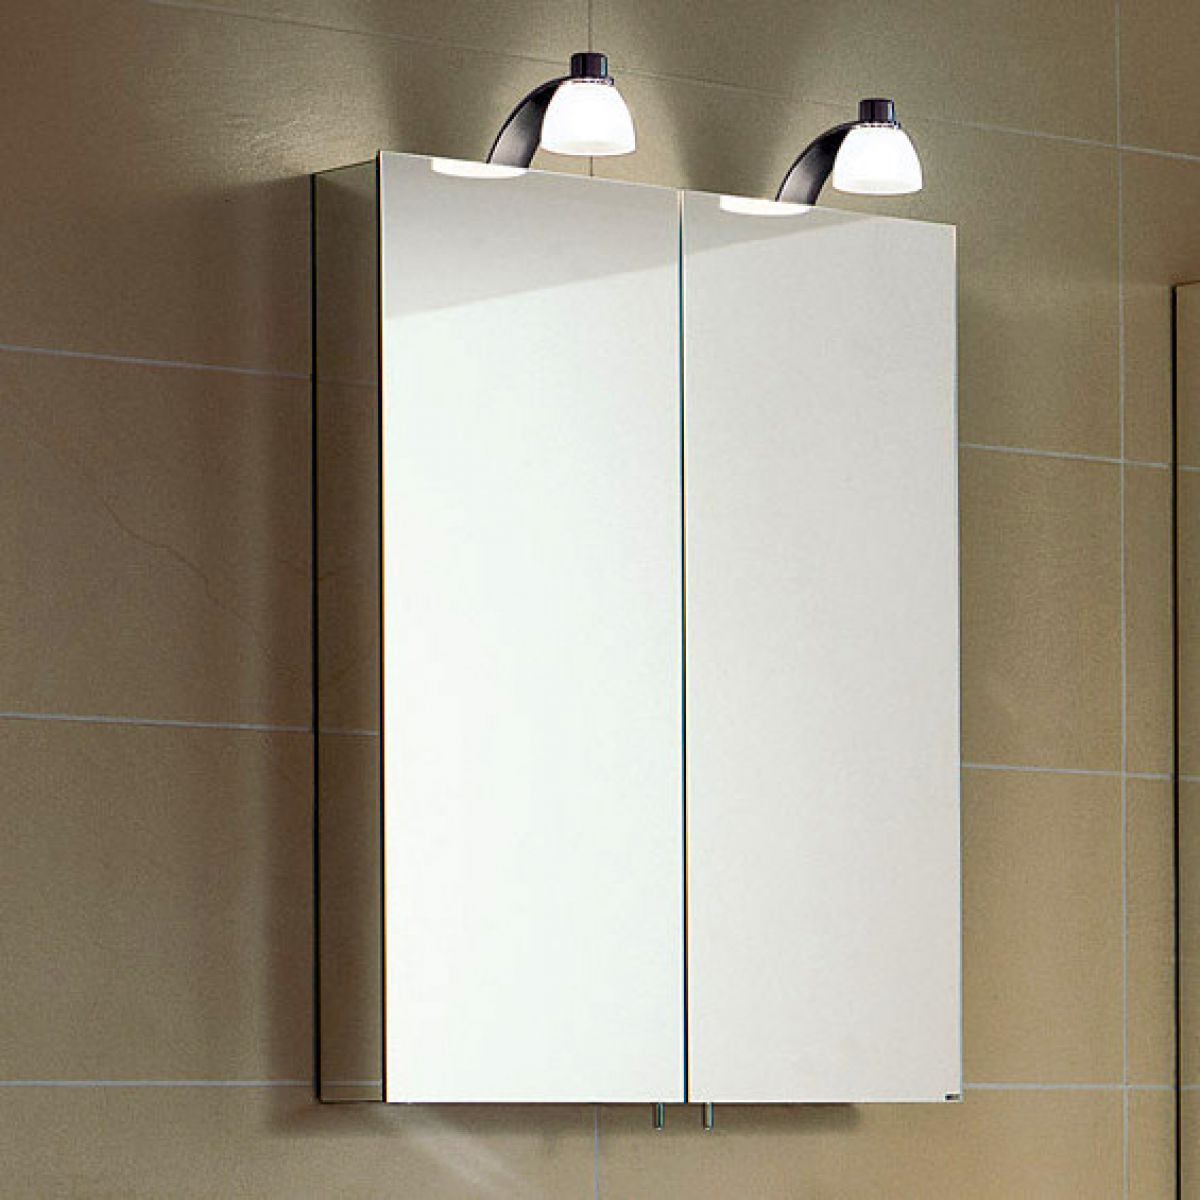 Keuco Royal 30 Mirror Cabinet 600mm : UK Bathrooms